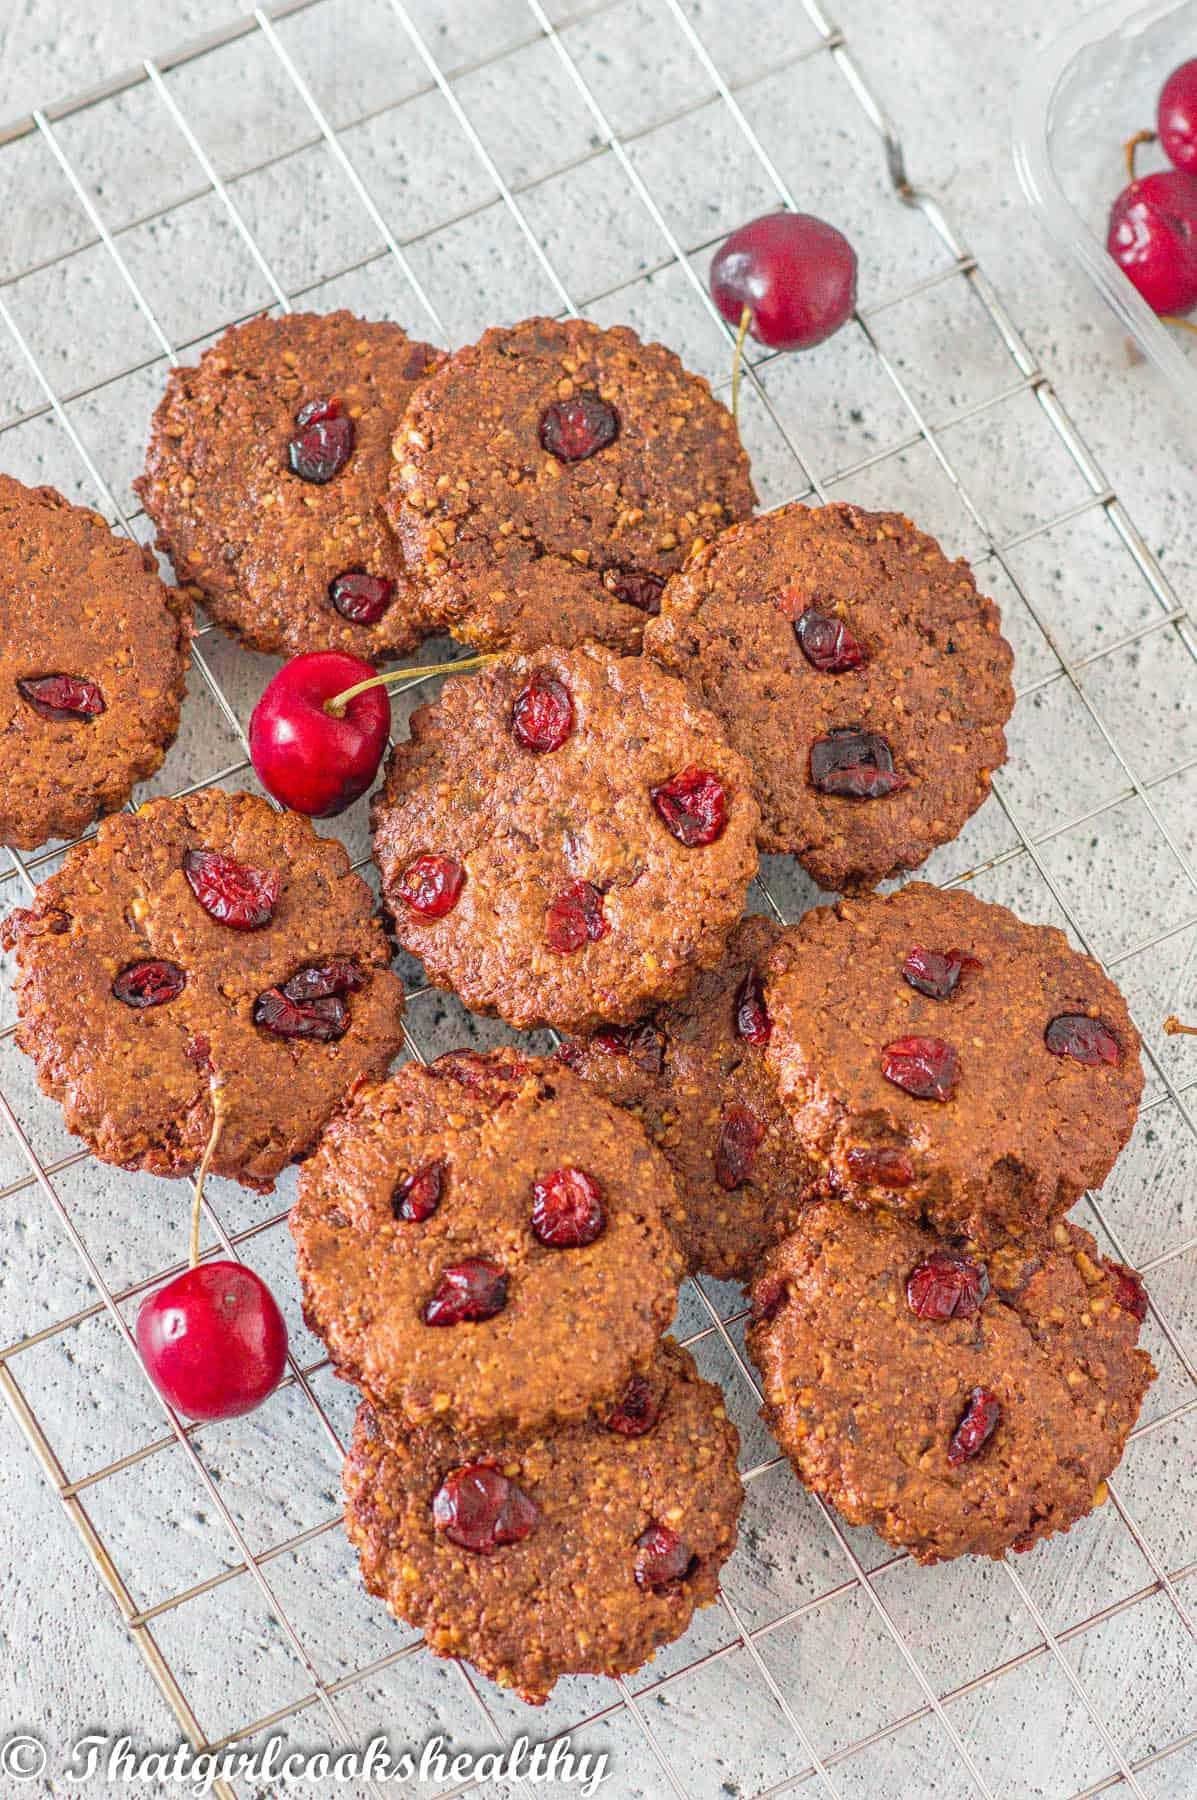 cookies with loose cherries on top